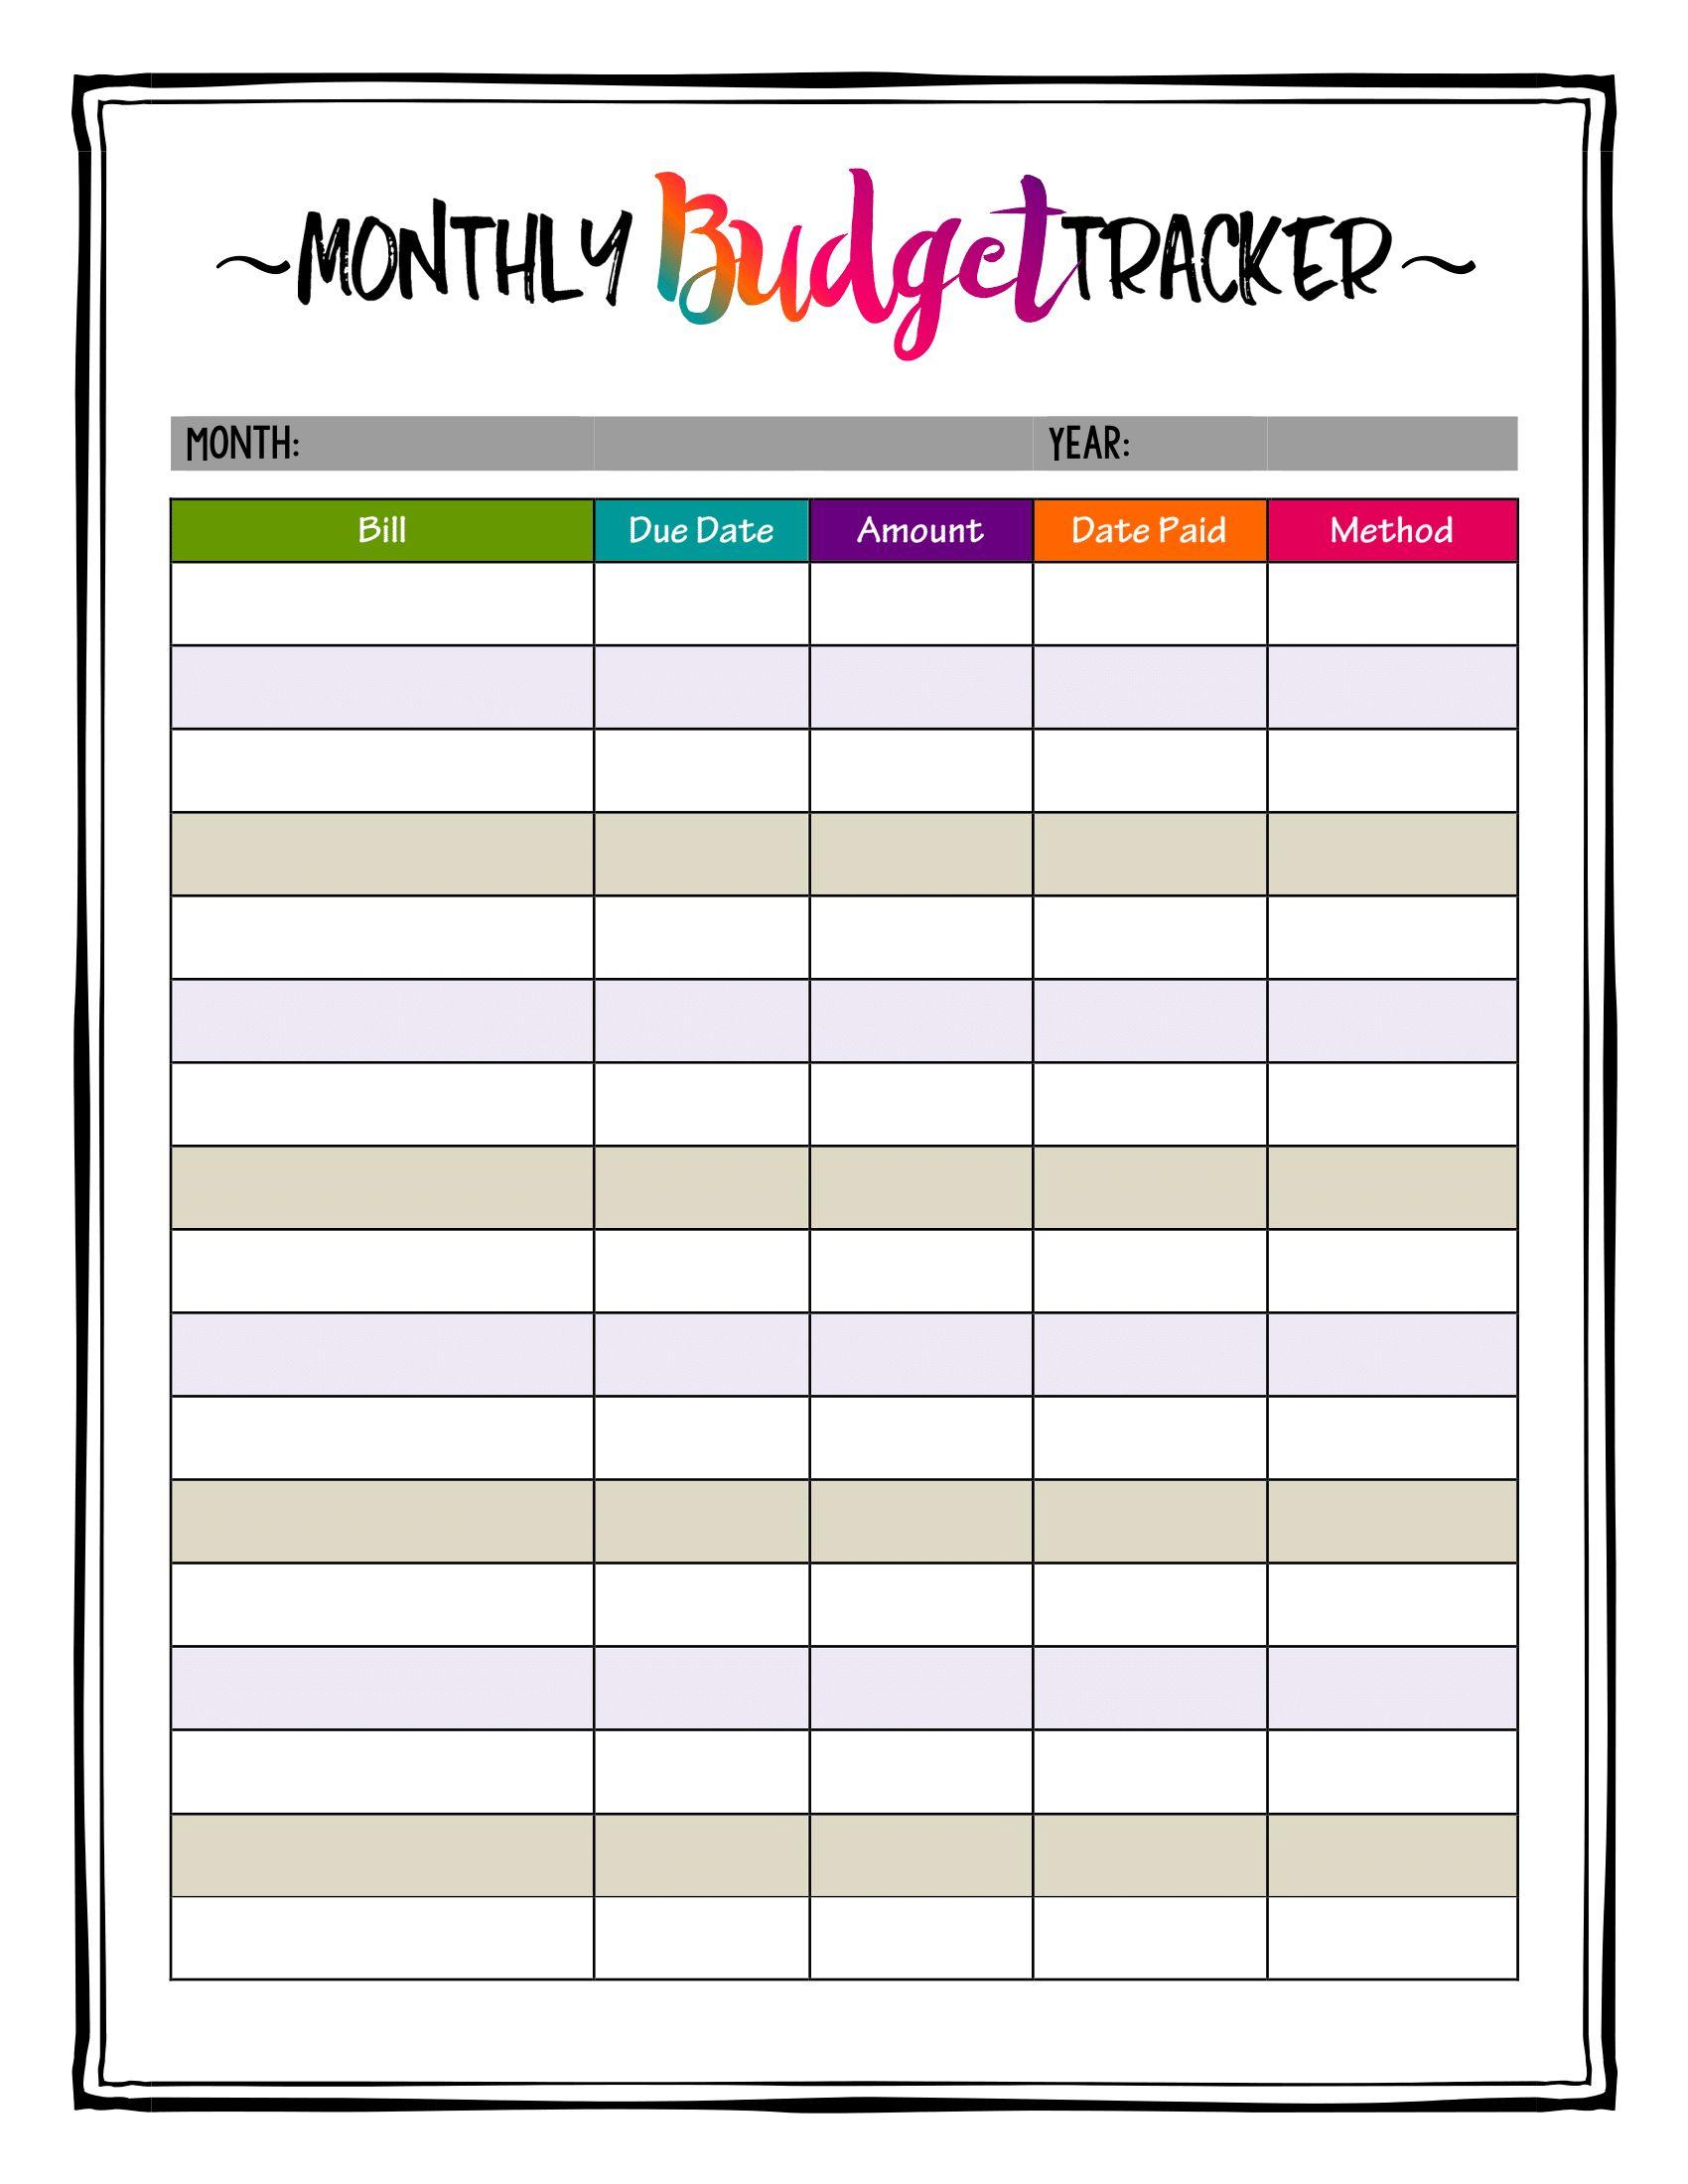 How To Organize Bills Super Bright Budget Tracker Makes